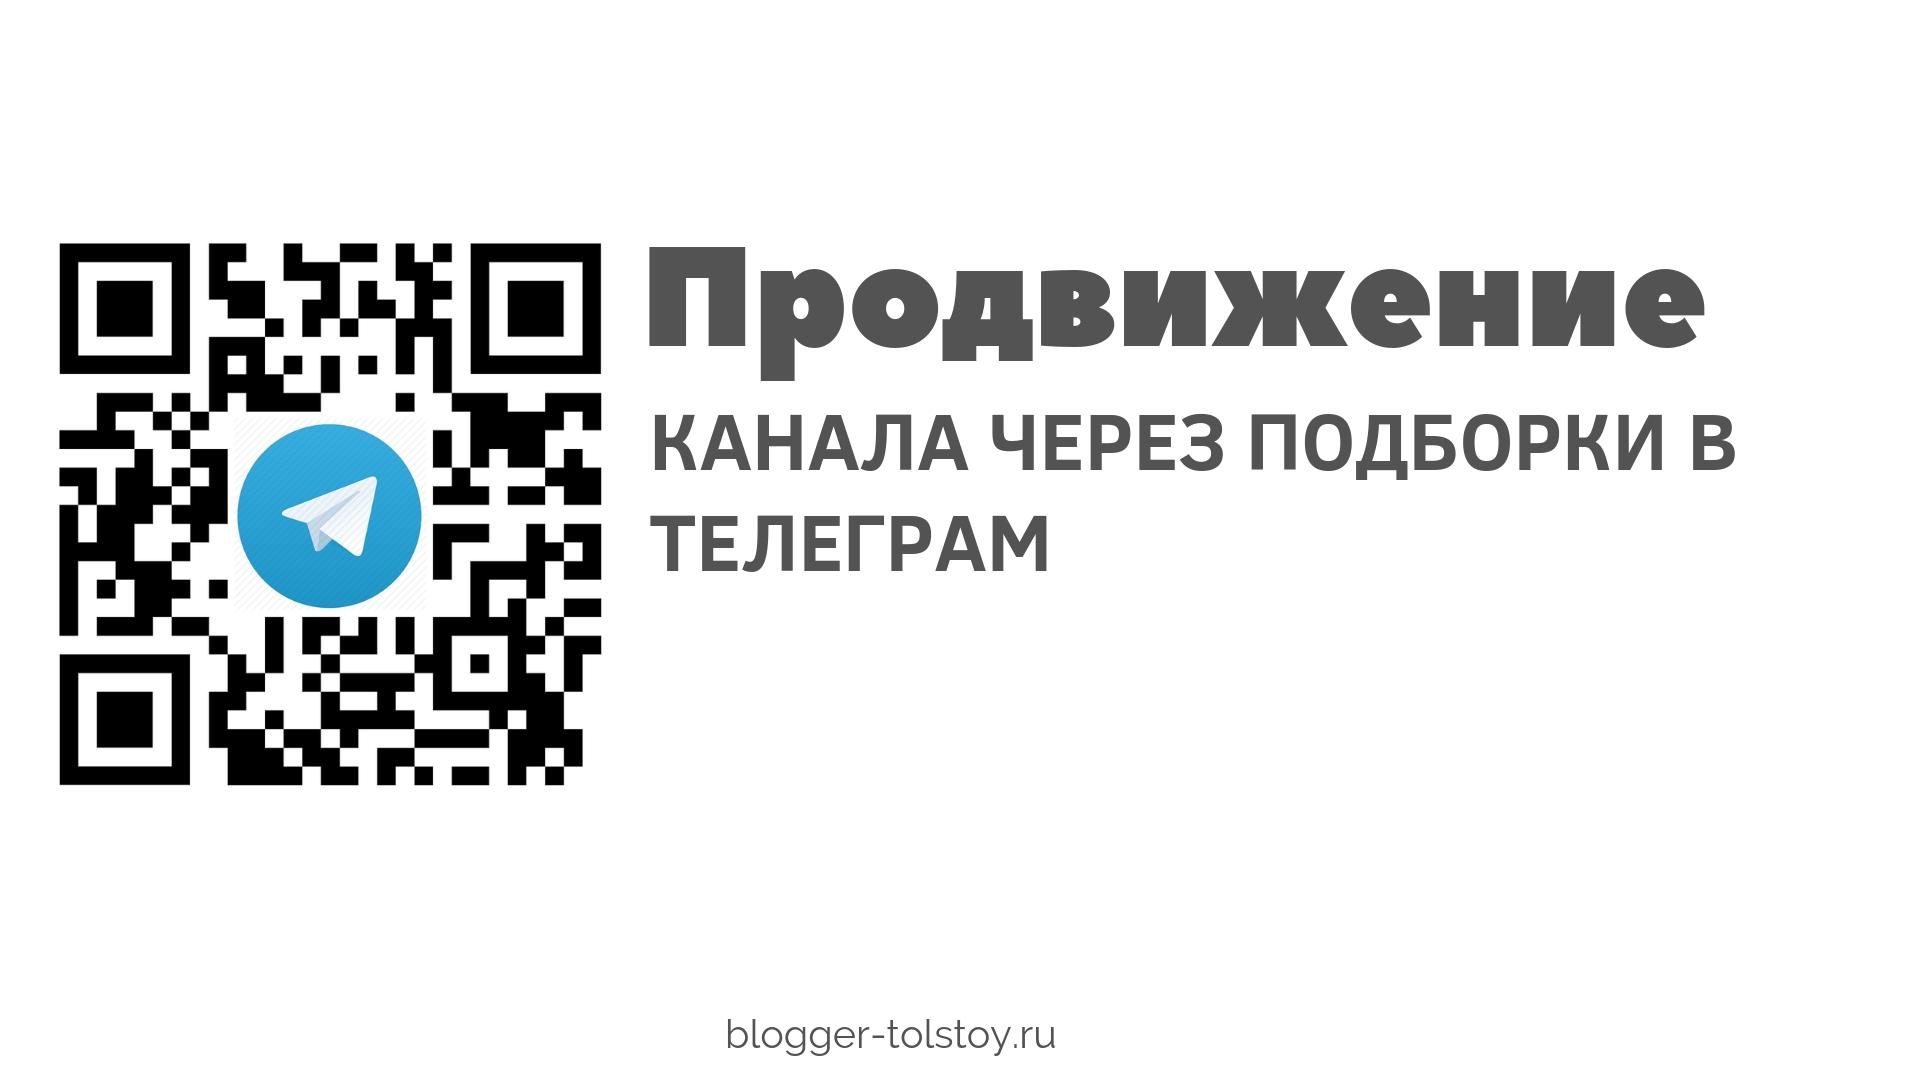 подборки в телеграм